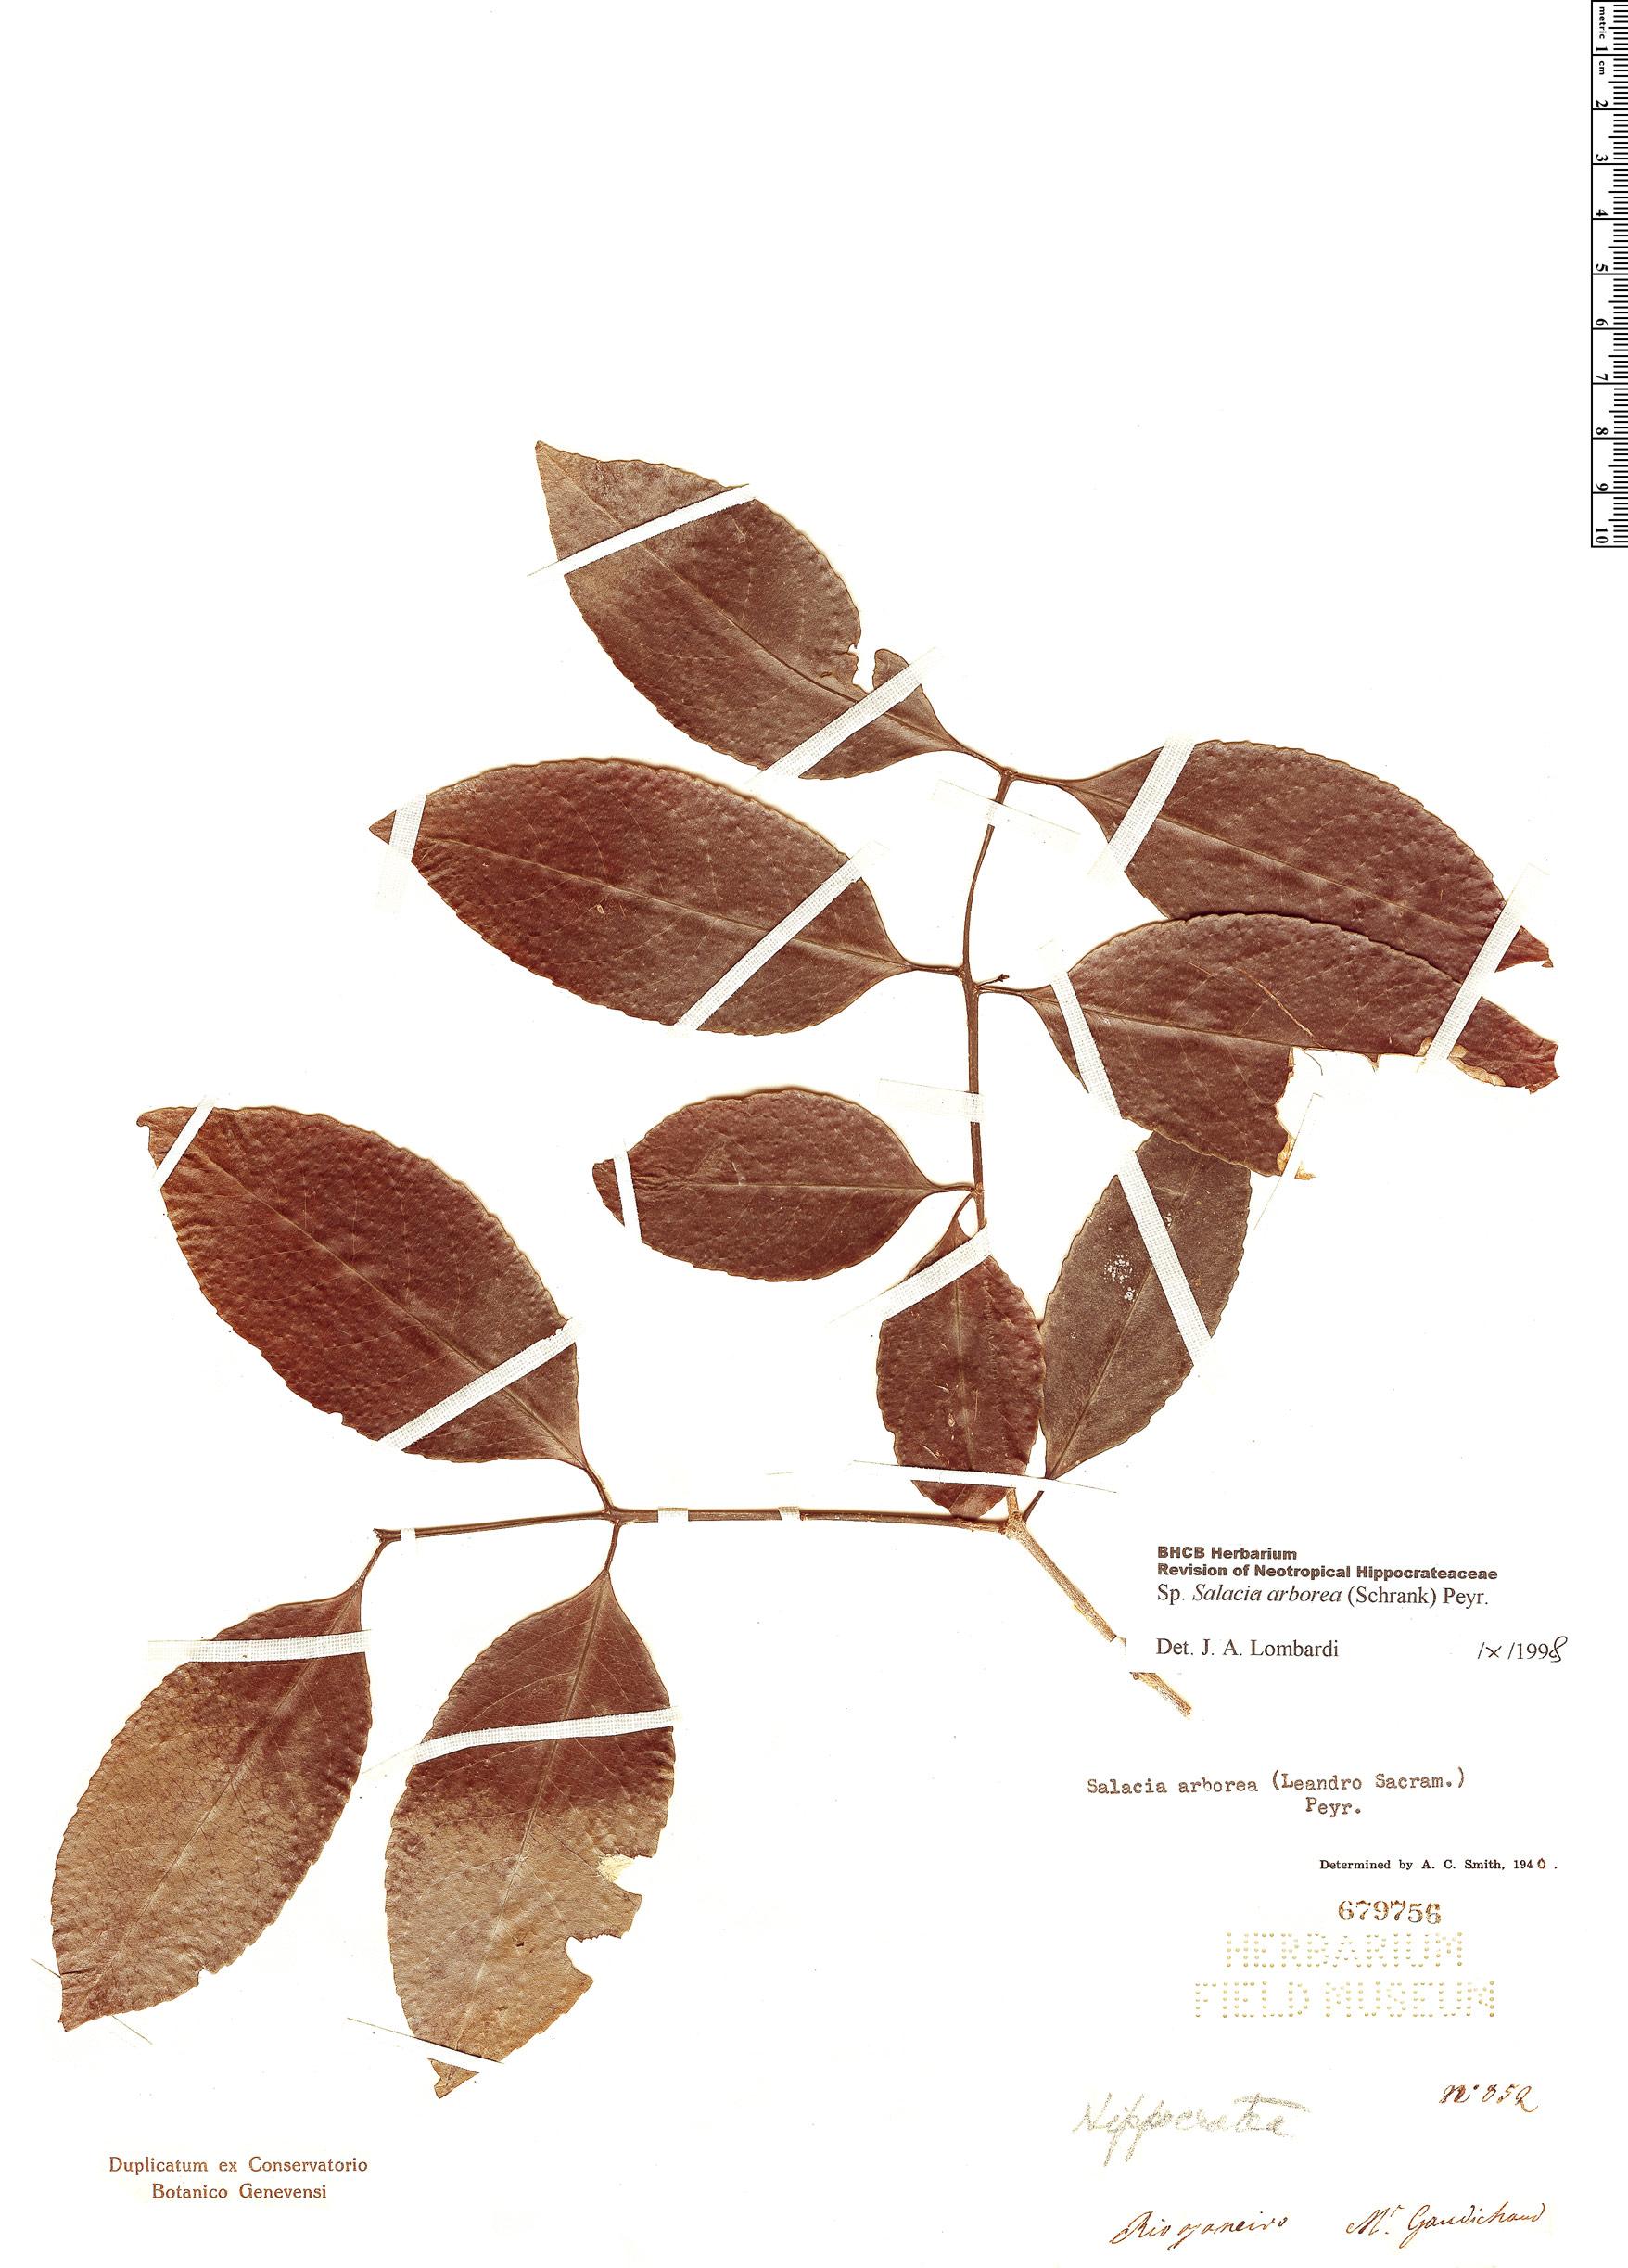 Specimen: Salacia arborea